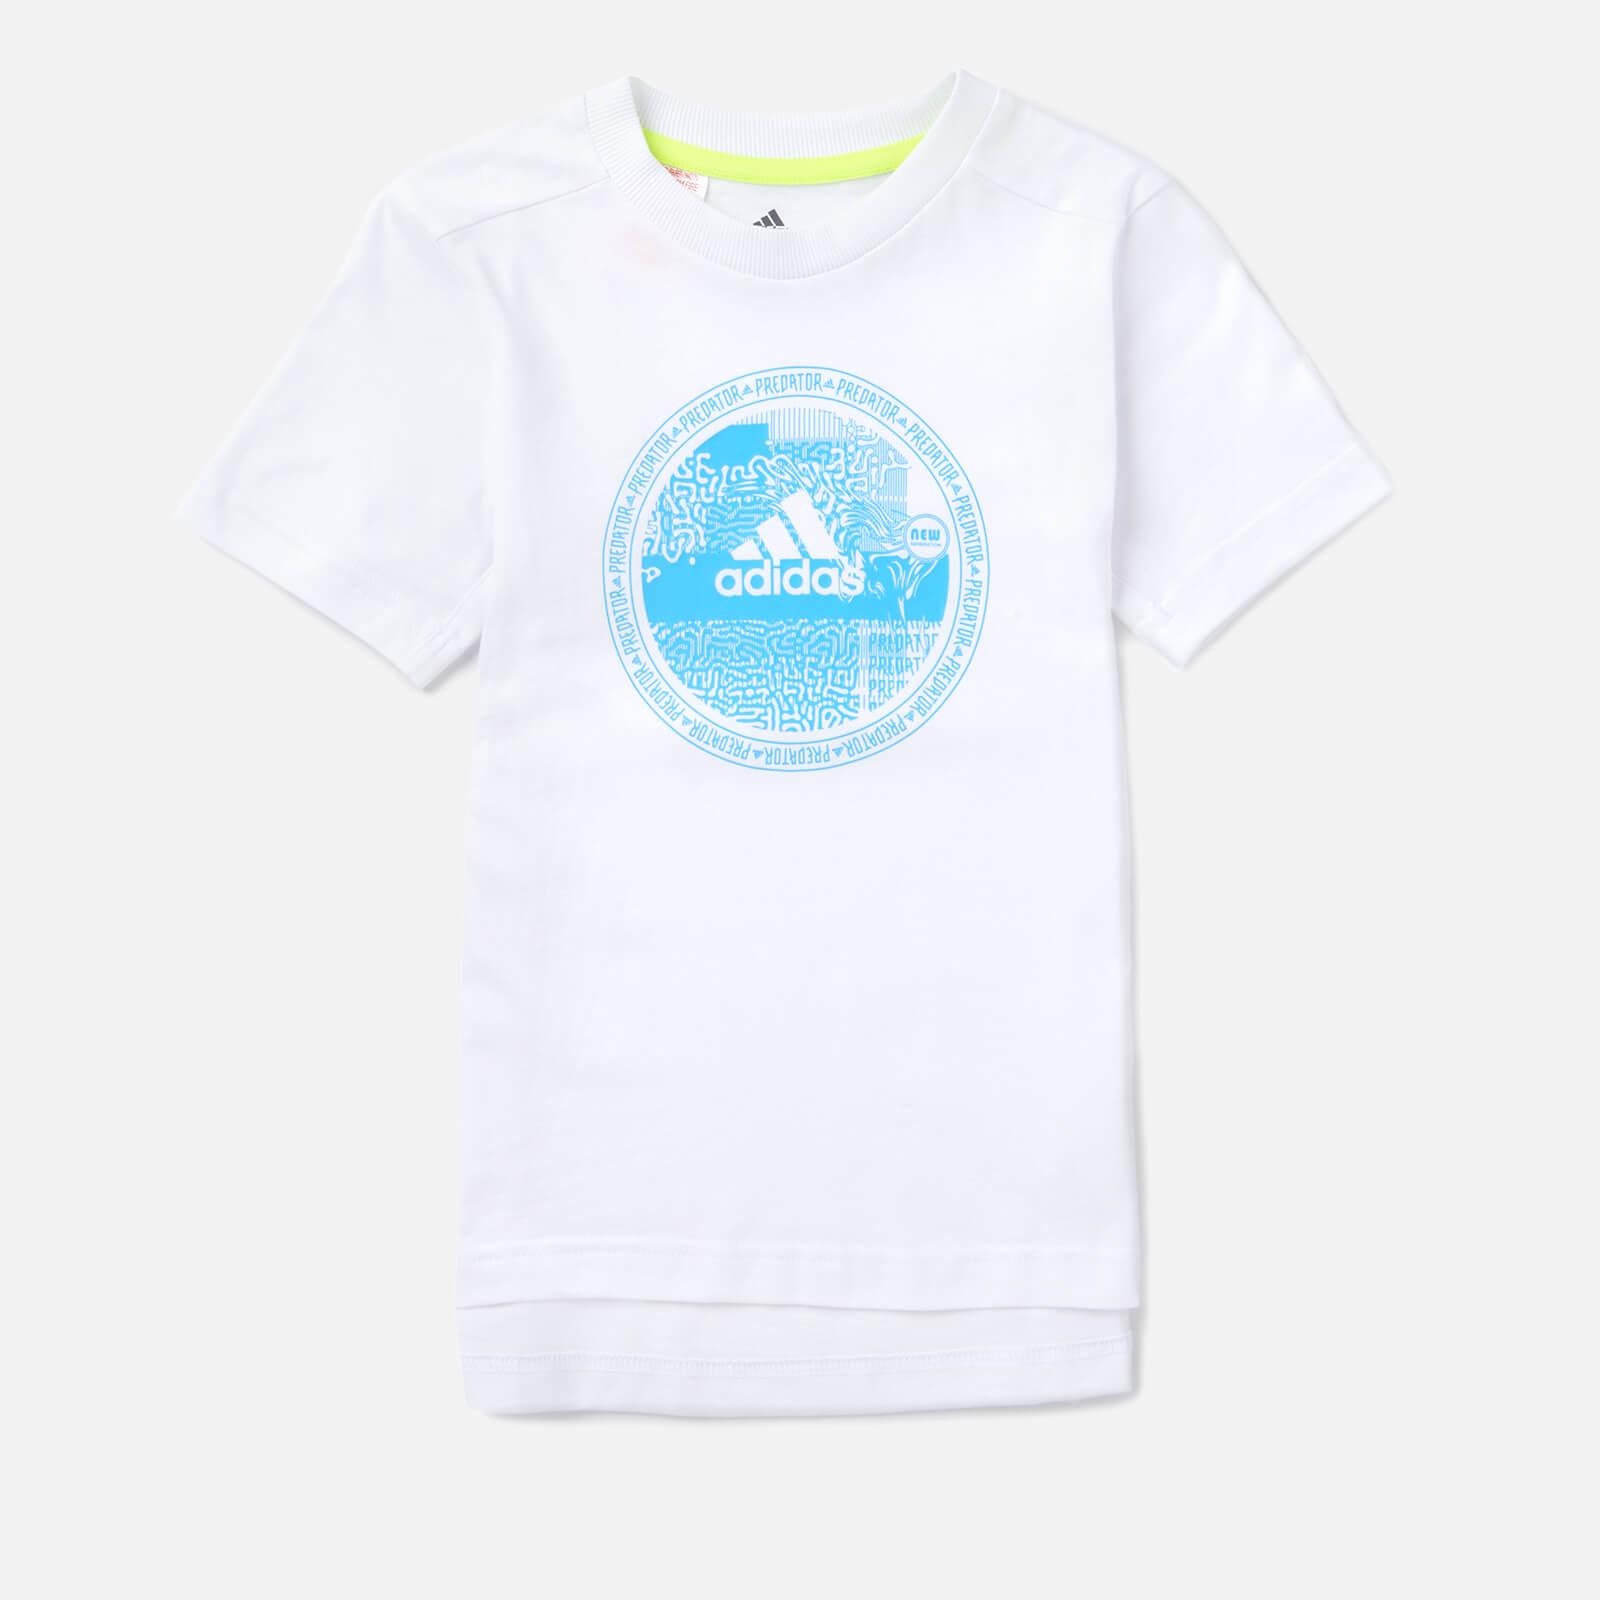 adidas Boys' Young Boys Predator T-Shirt - White - 9-10 Years